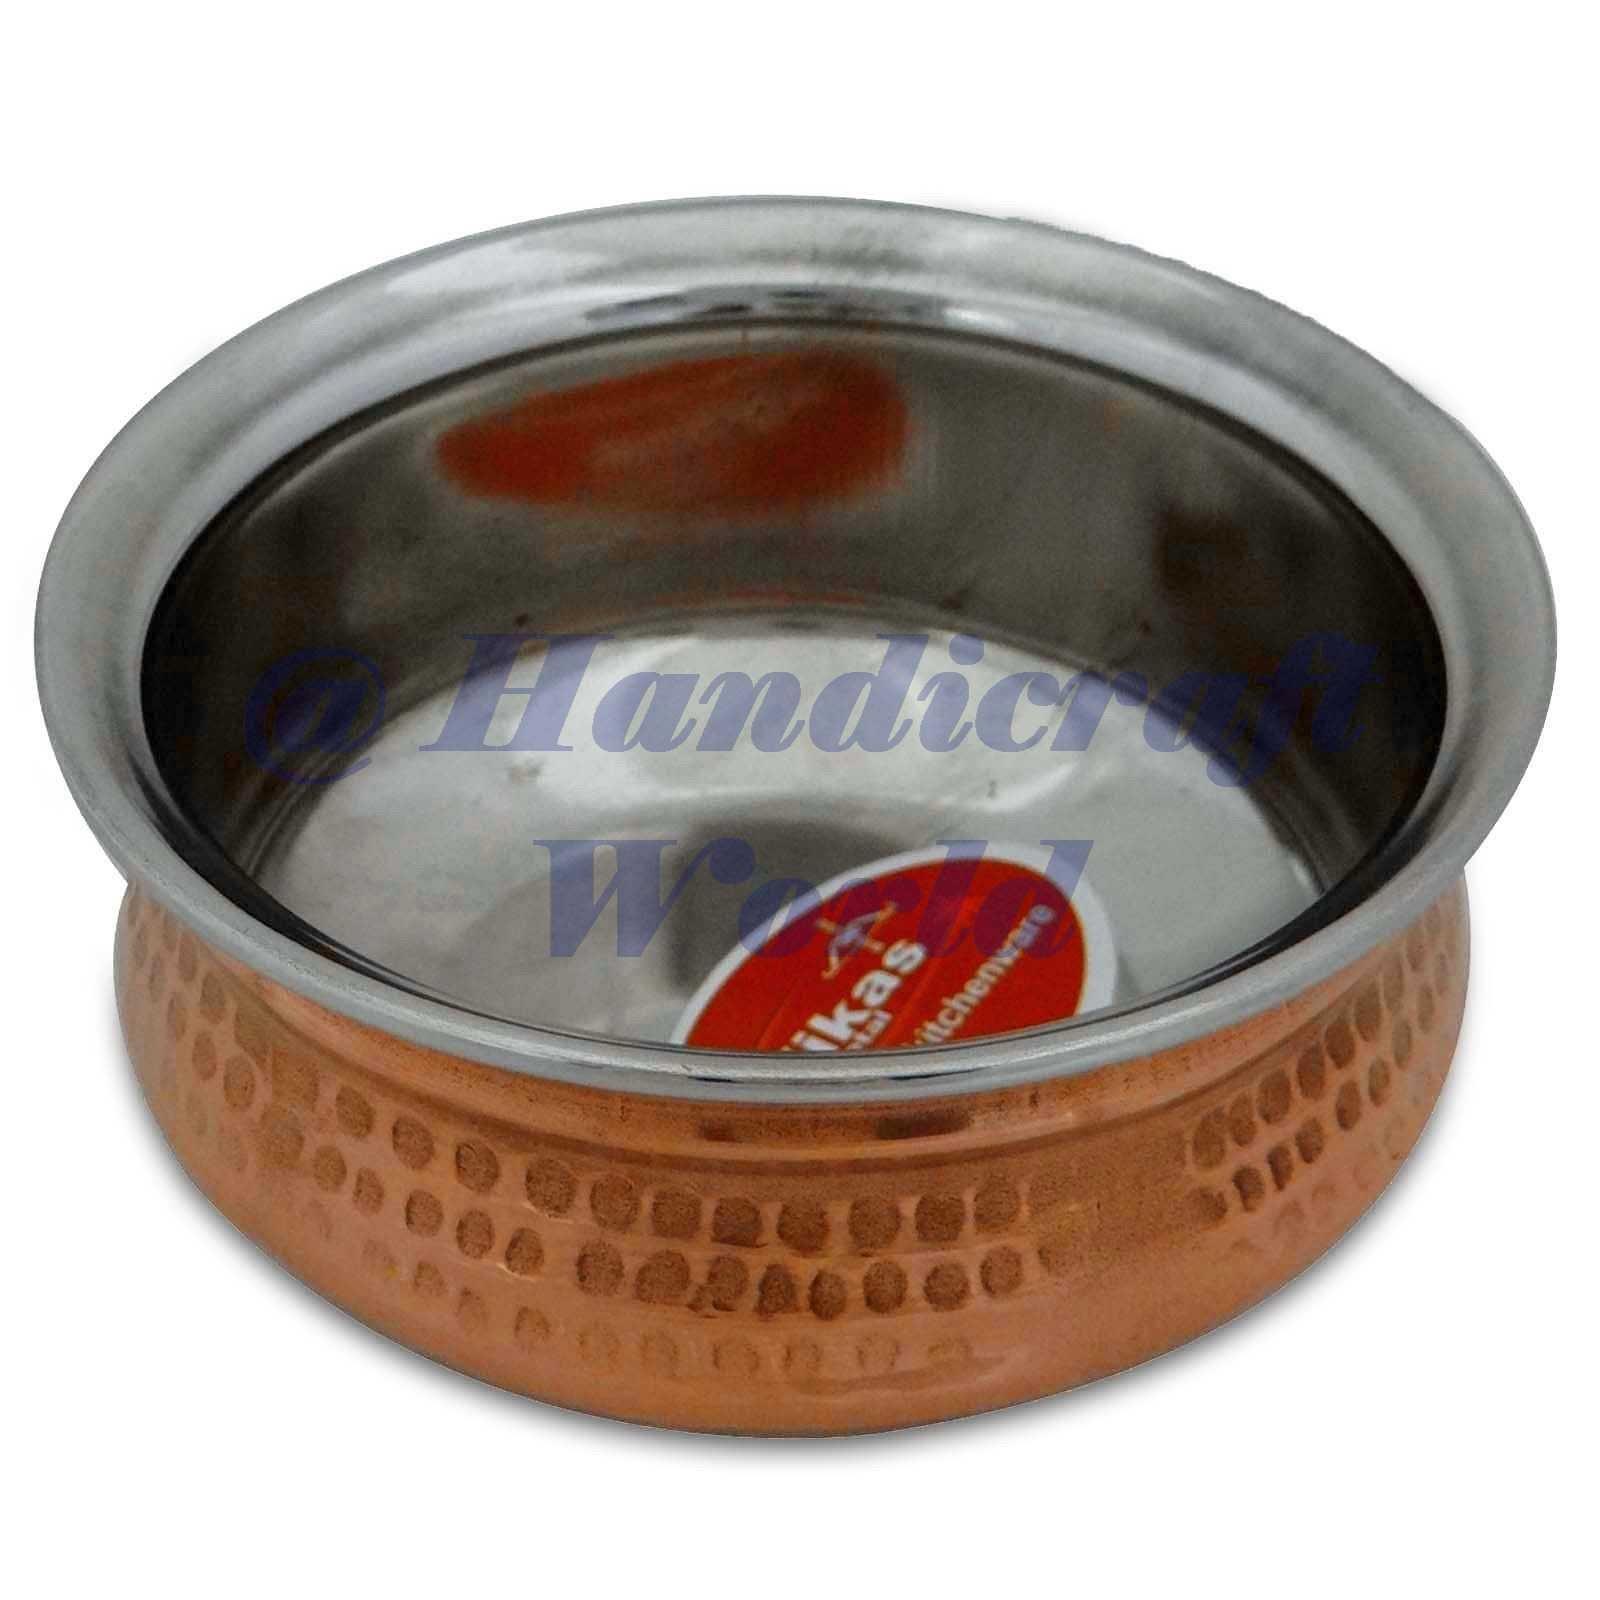 Copper Steel Handi Serving Bowl Tableware India Kitchen Utensil Dia 5.8'' Inches